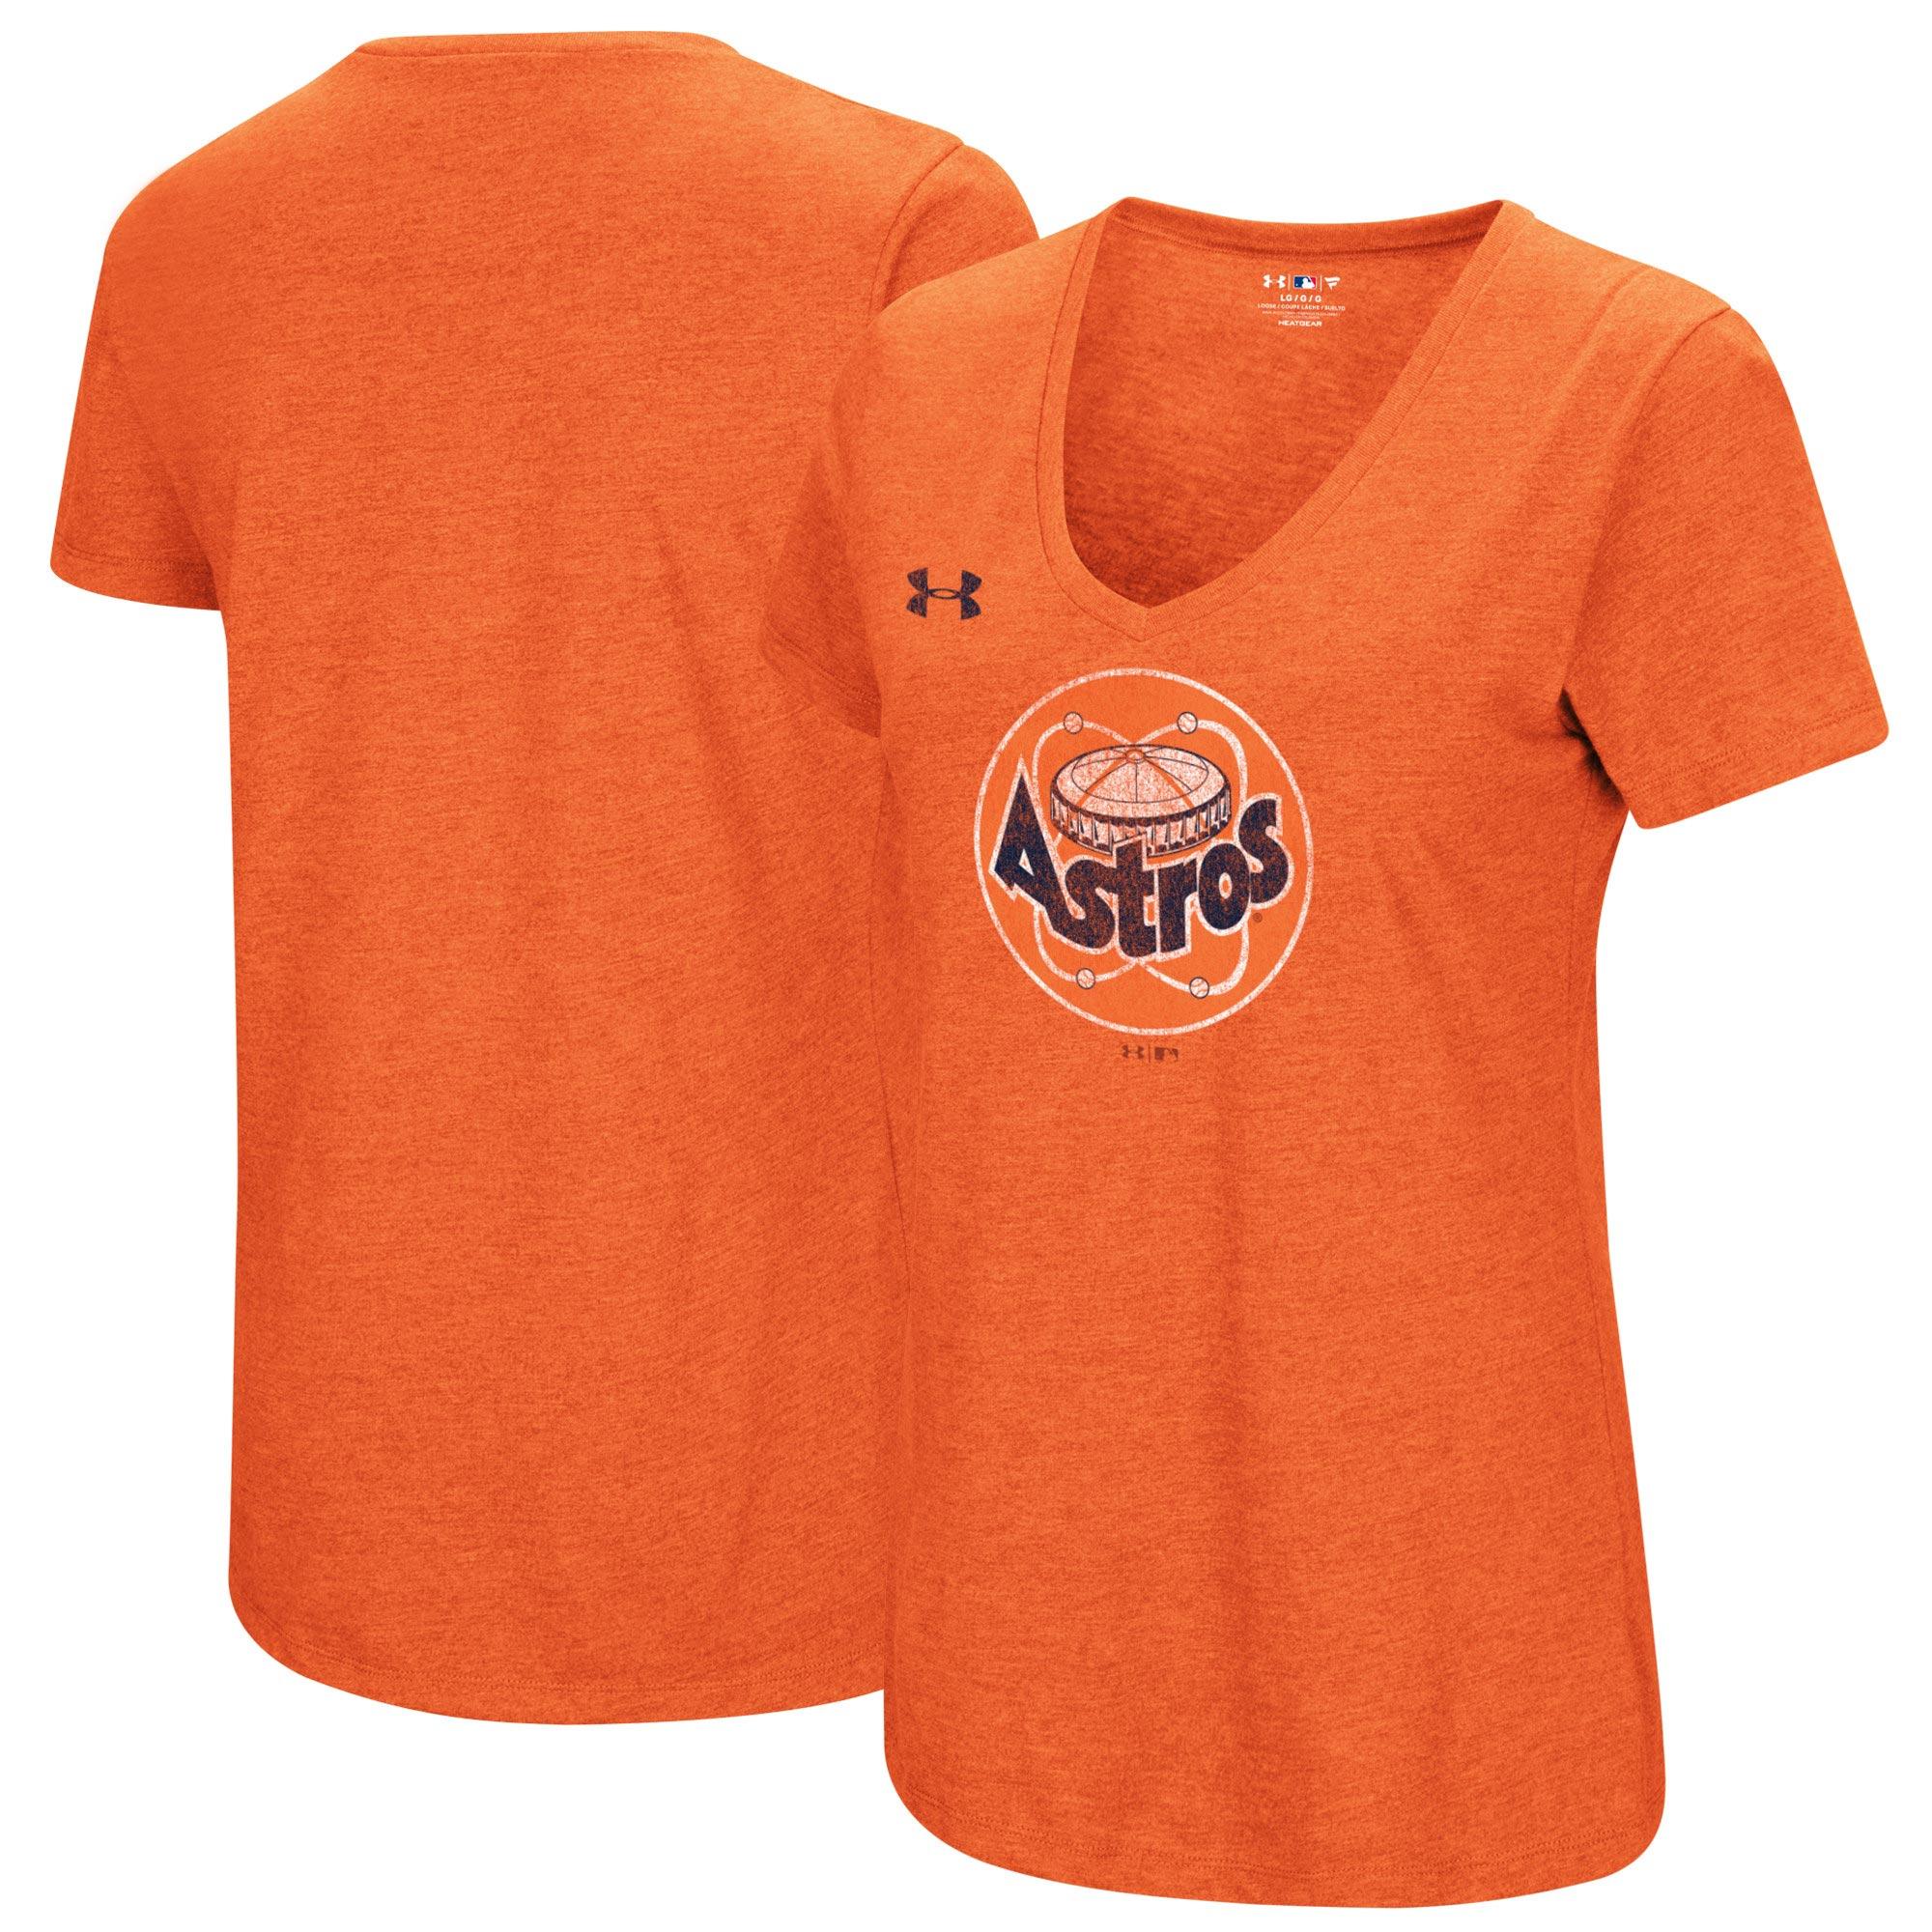 Houston Astros Under Armour Women's Cooperstown Collection Logo Performance Tri-Blend V-Neck T-Shirt - Heathered Orange